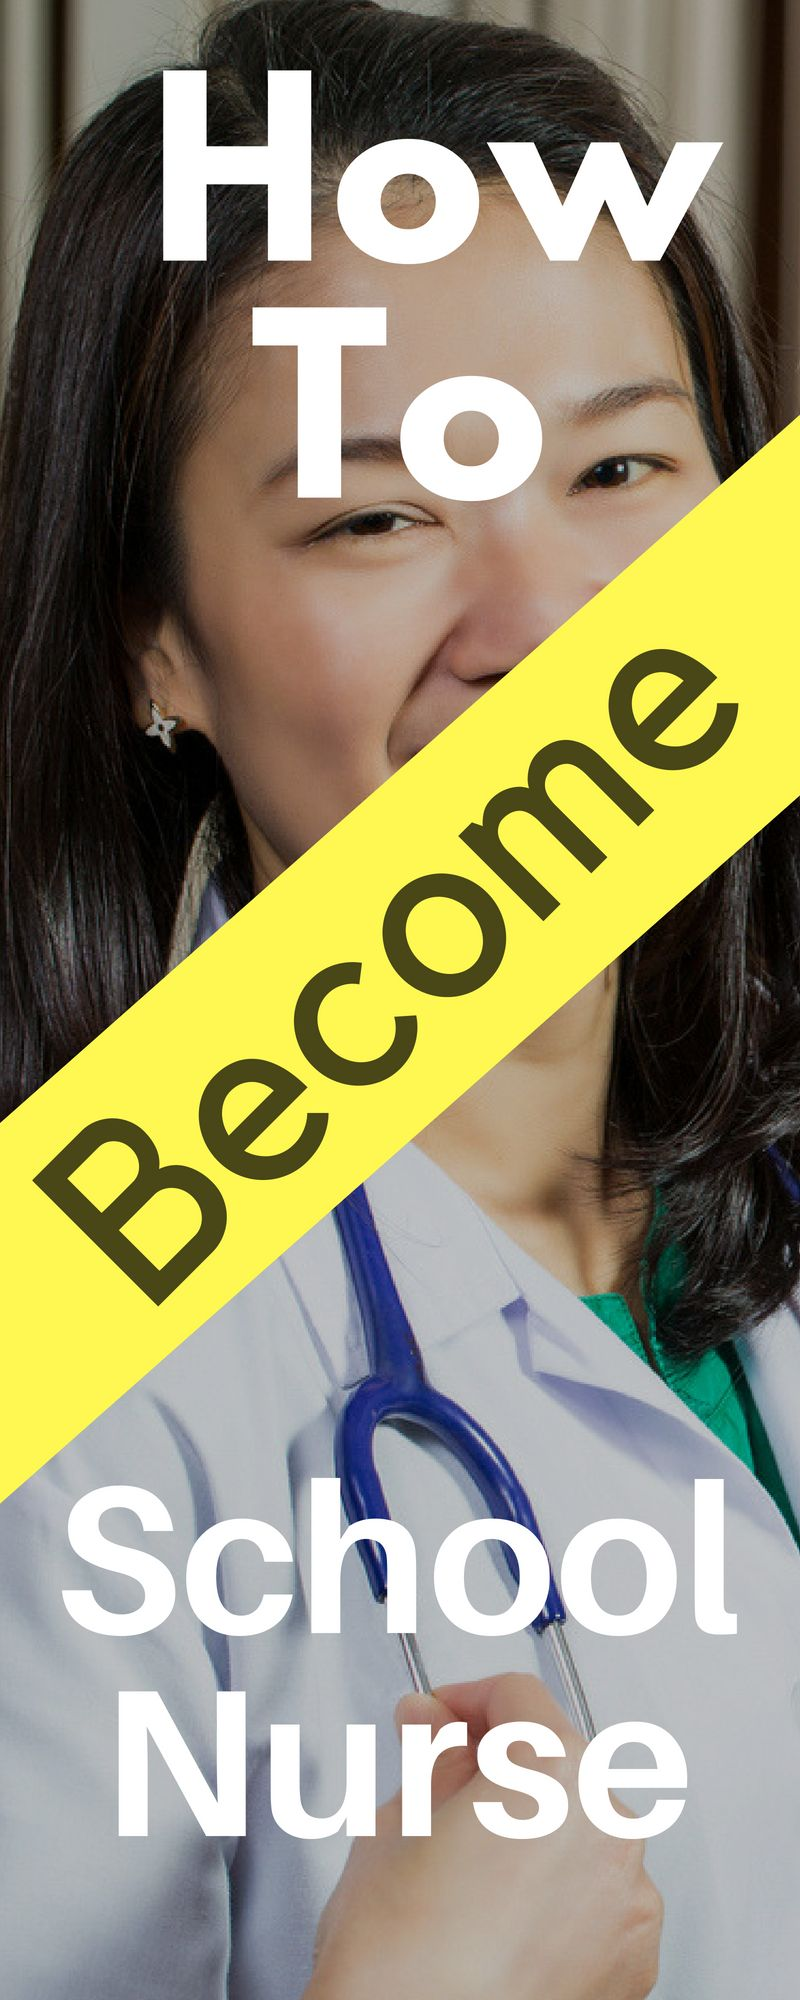 How to a School Nurse Job Description, Salary and